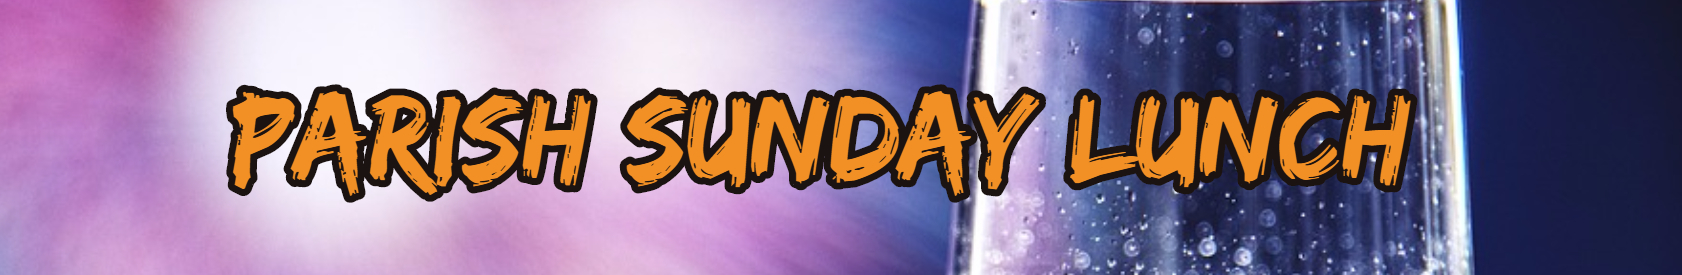 Parish Sunday Lunch – 17 November 2019